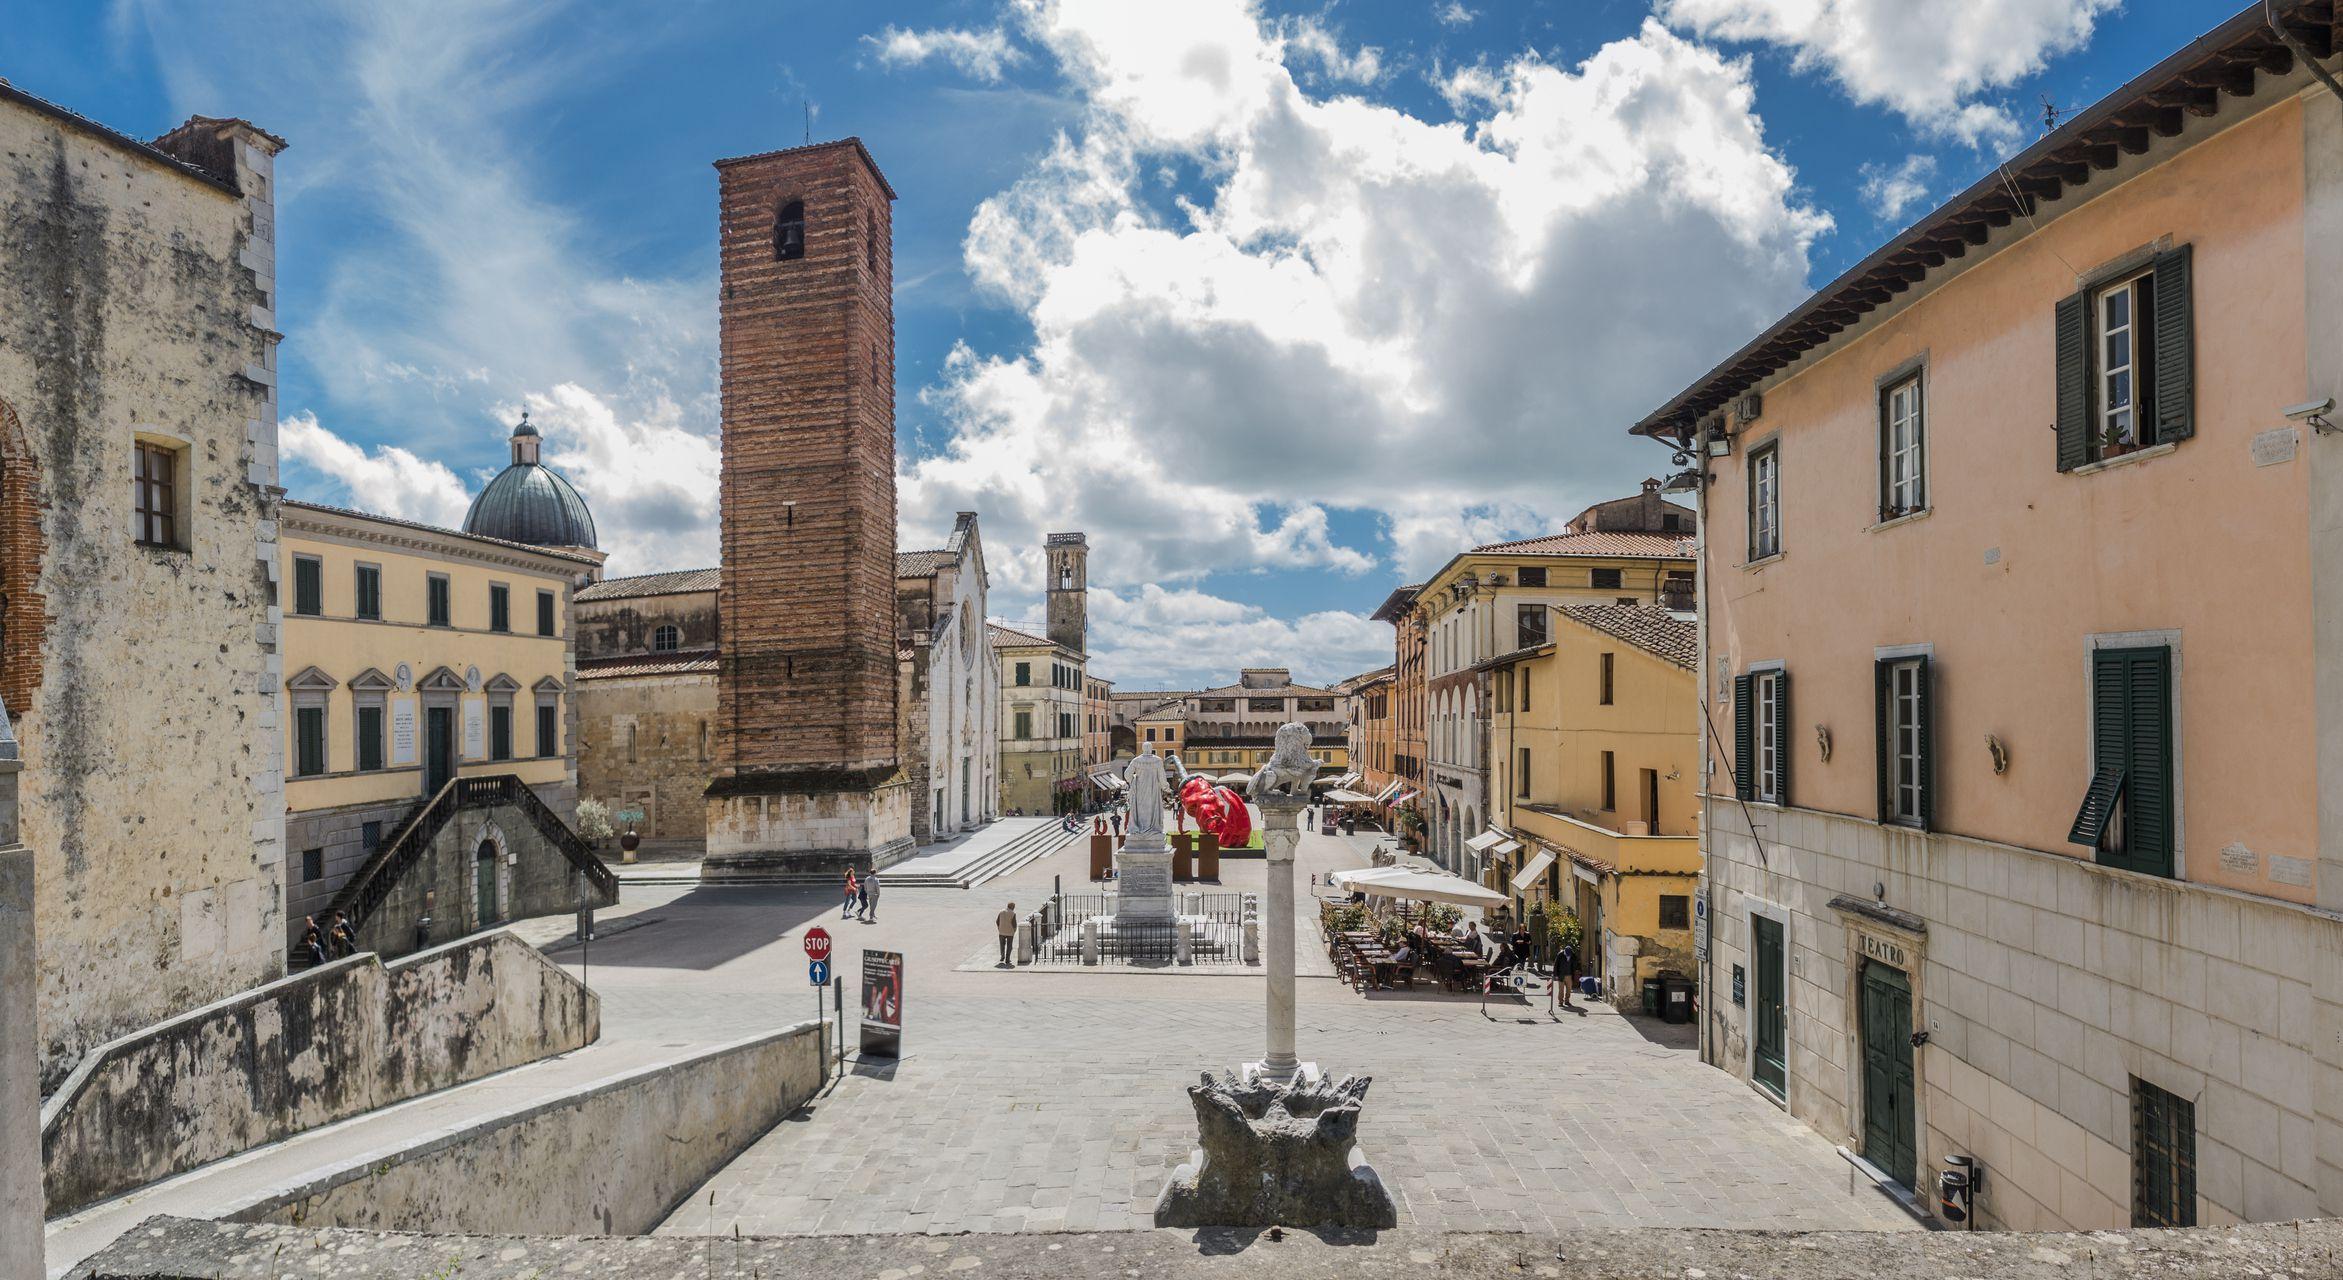 Pietrasanta, Italy Travel Guide